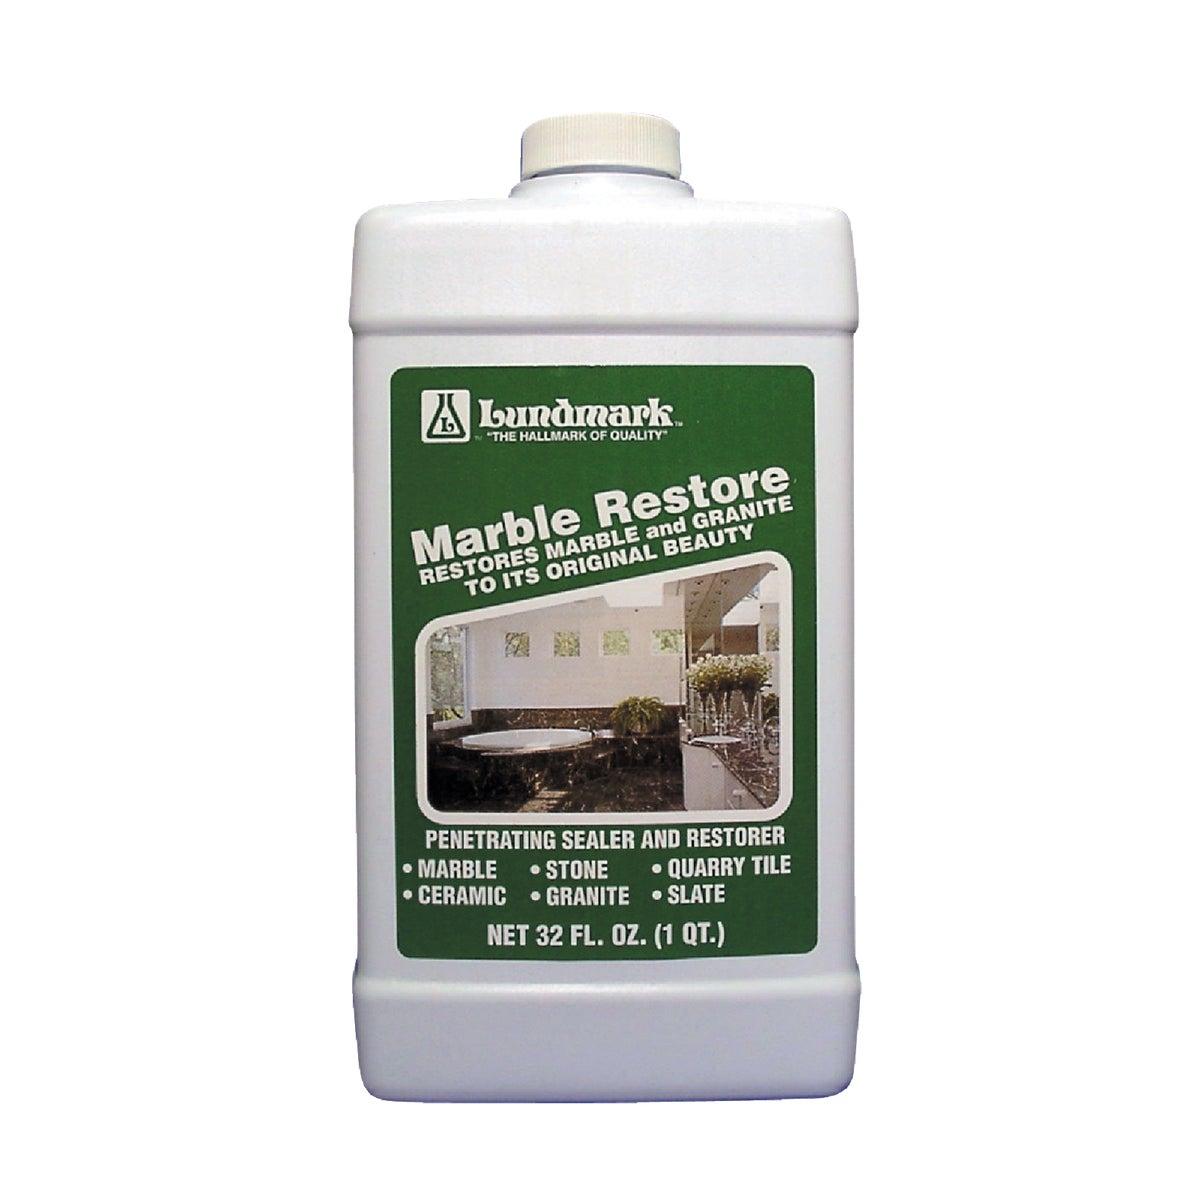 Lundmark Wax 3536F32-6 Marble Restore